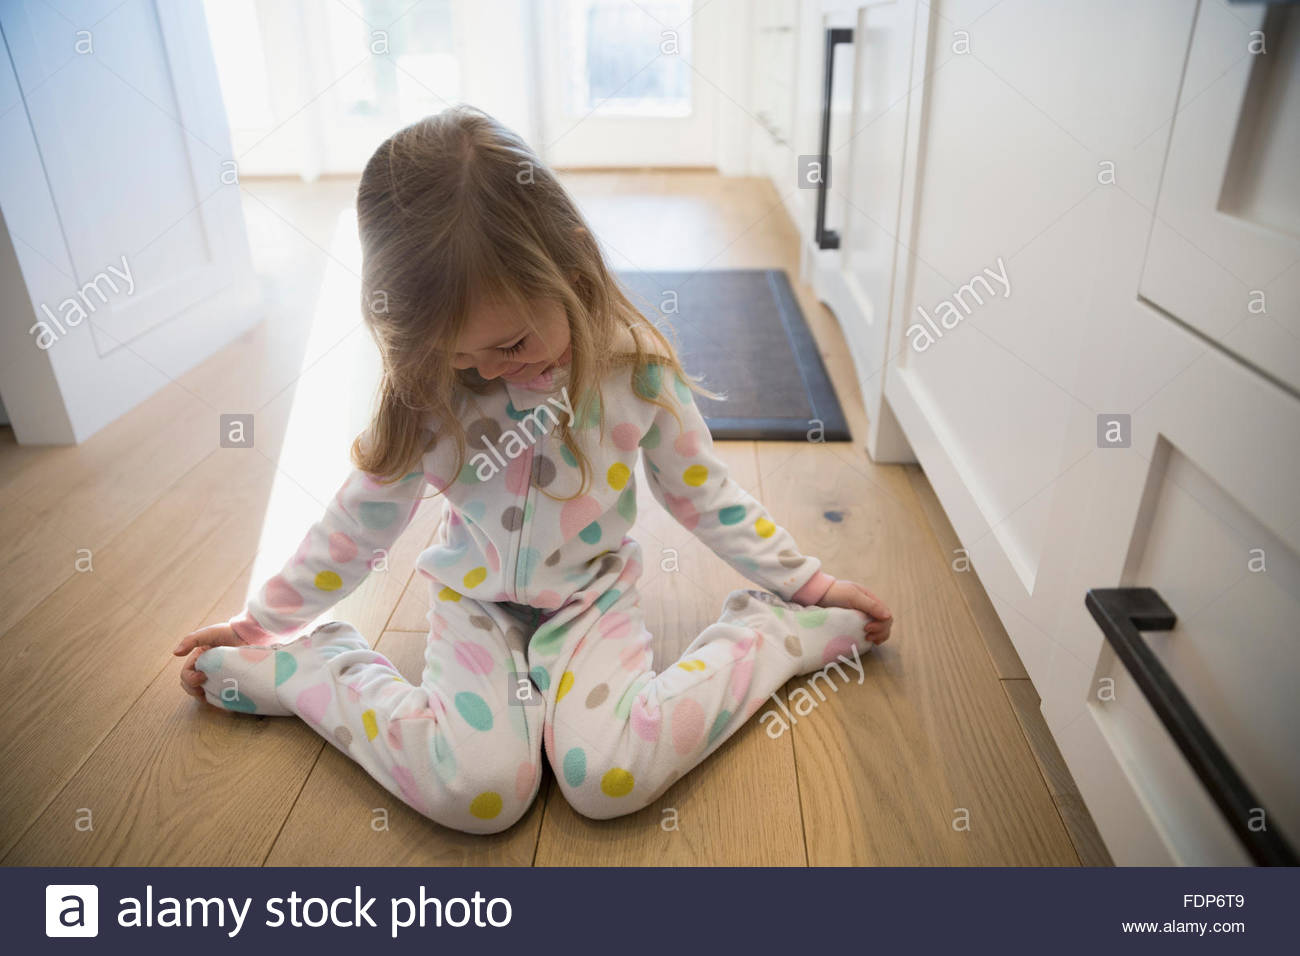 Cute girl polka-dot pajamas sitting kitchen floor - Stock Image